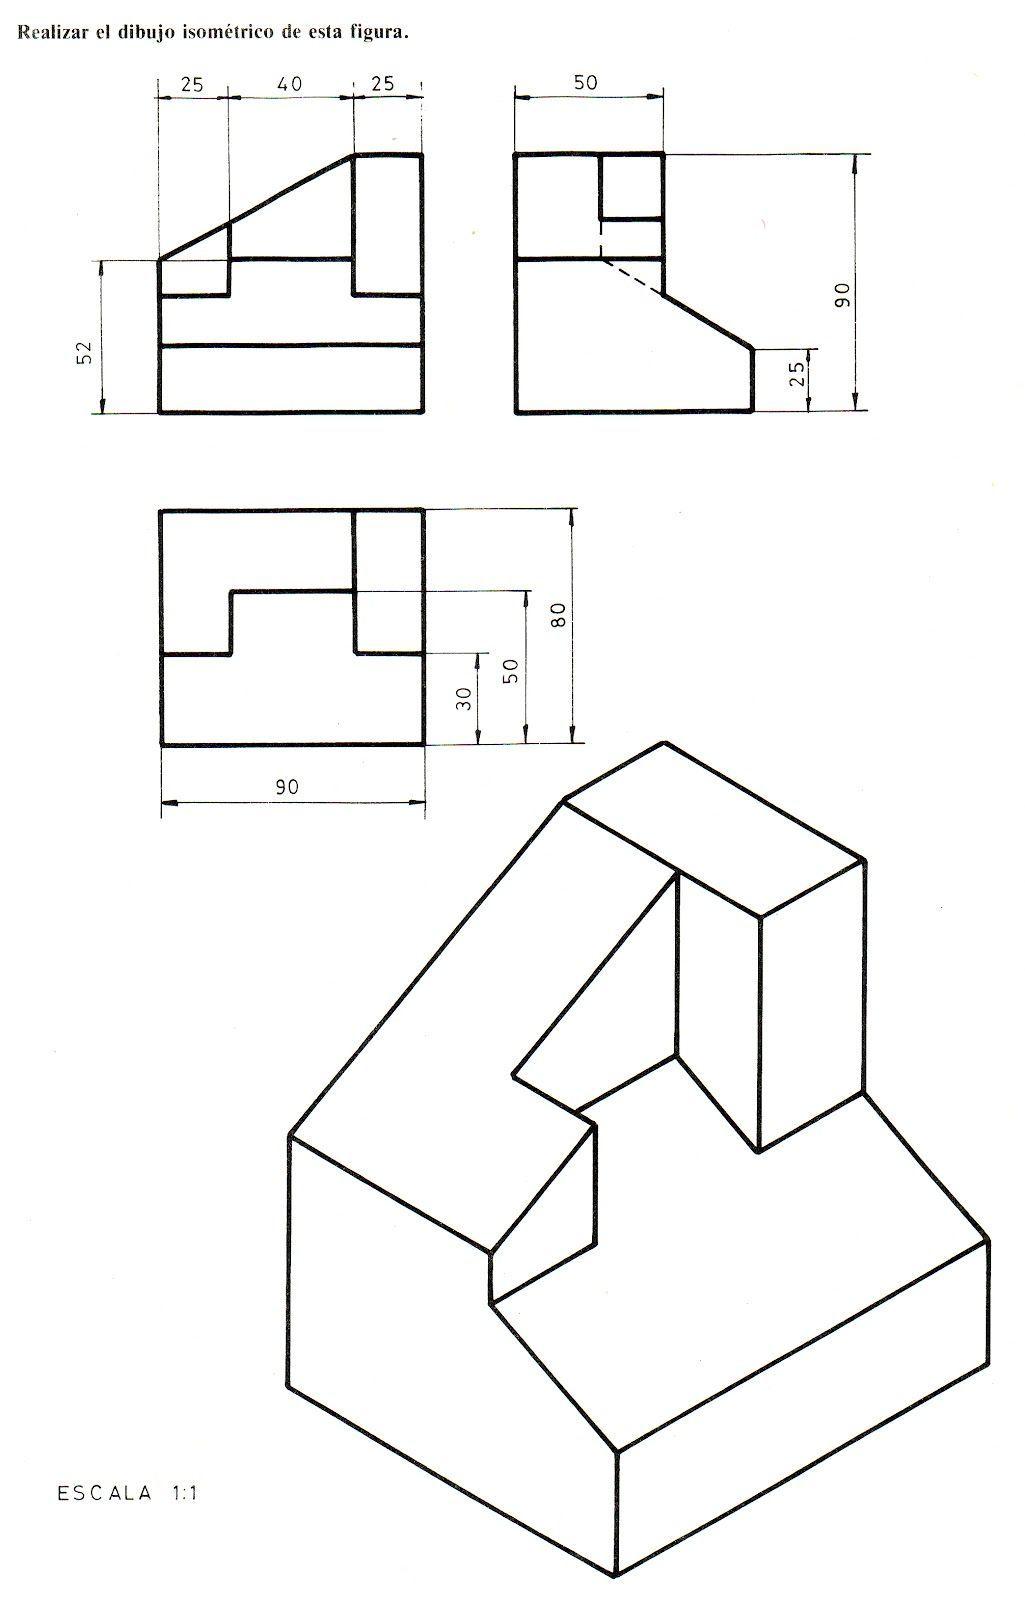 Risultato Immagini Per Plantilla Isometrica De Puntos Ejercicios De Dibujo Vistas Dibujo Tecnico Tecnicas De Dibujo